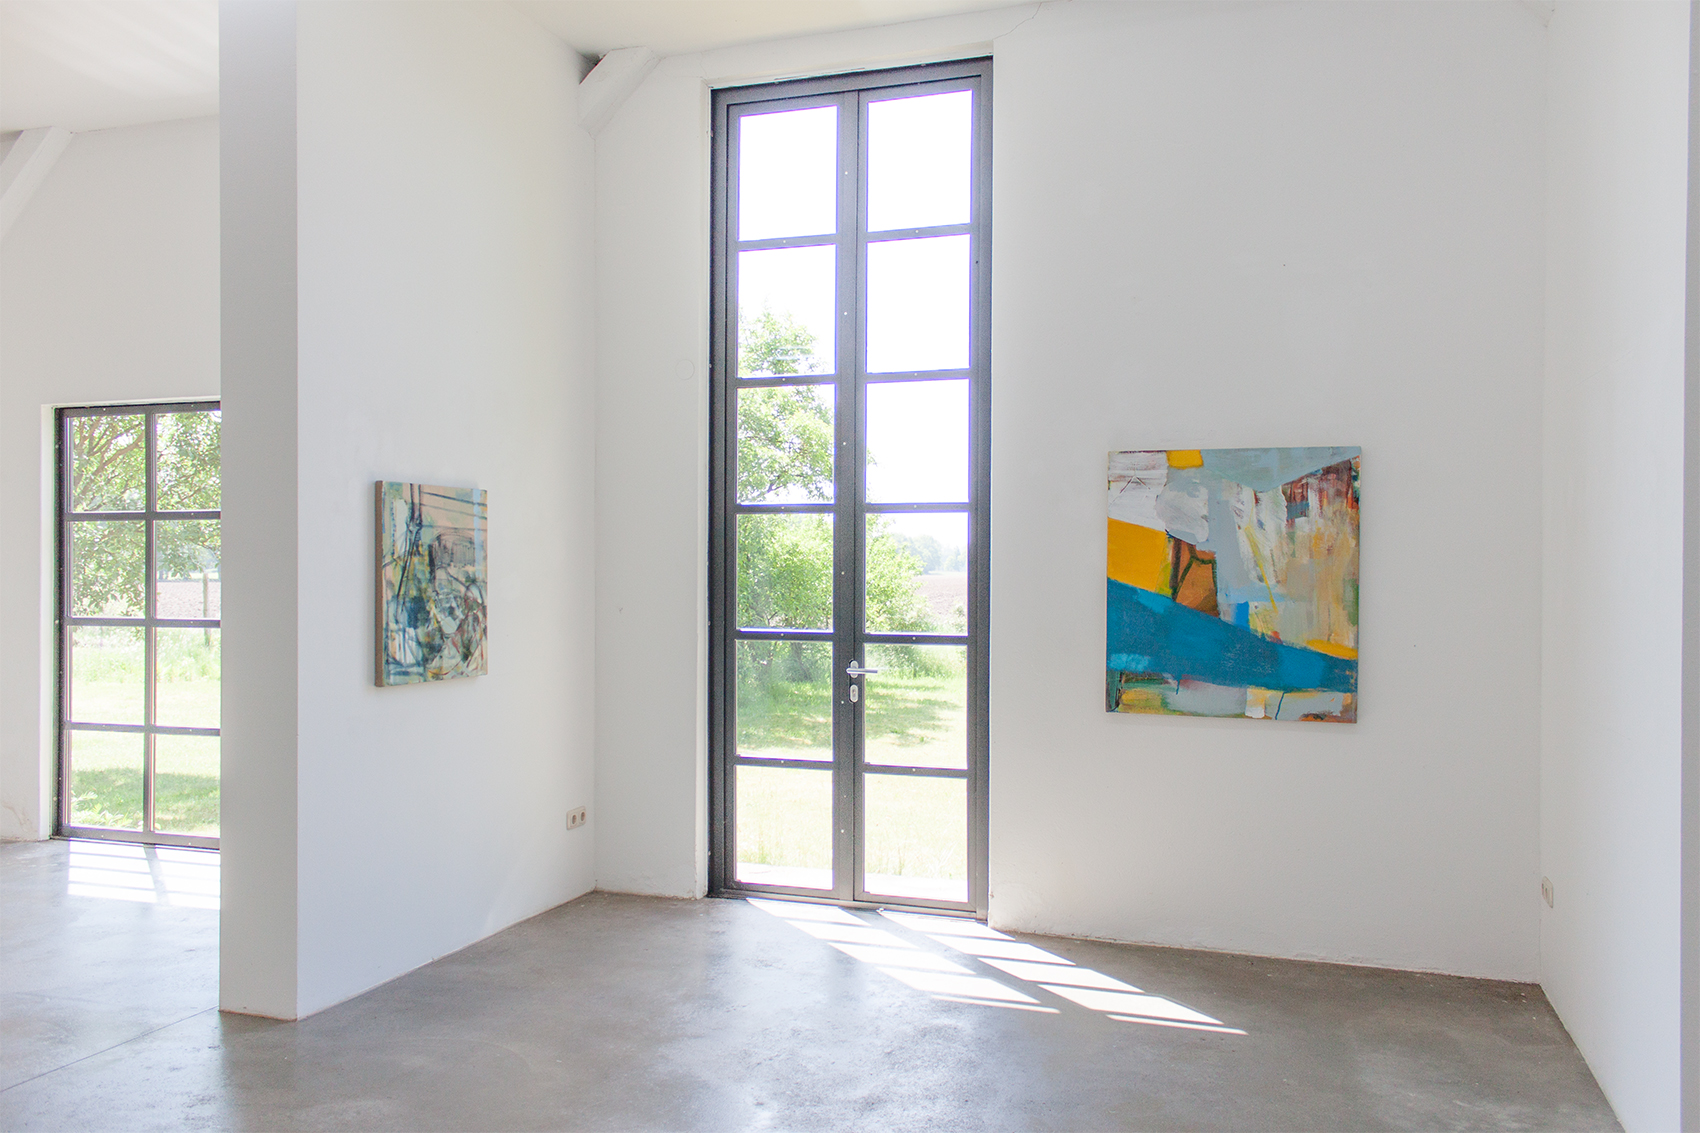 Galerie Born, Berlin, Markwick